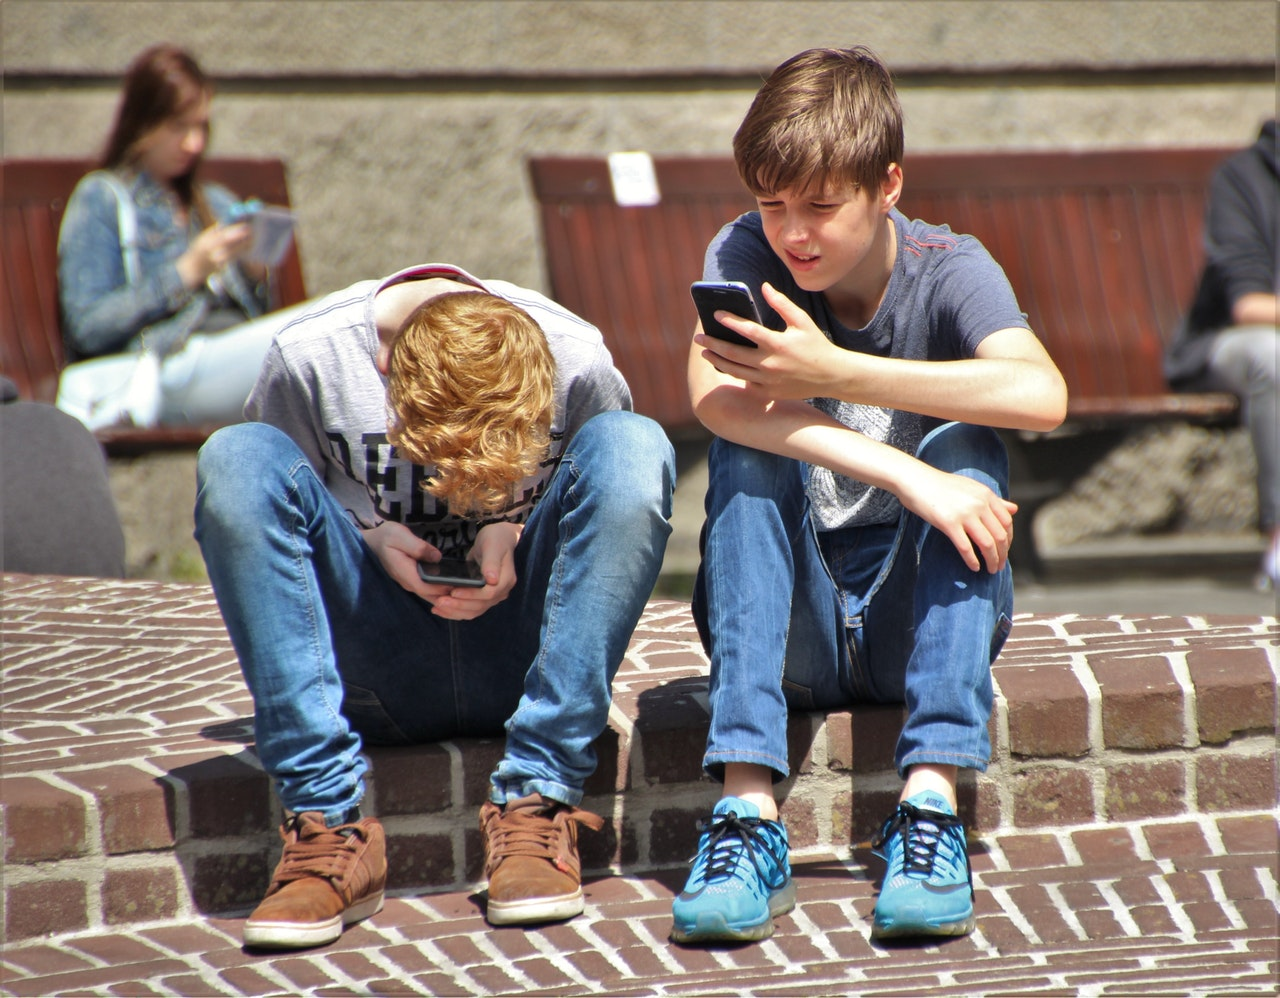 Internet Children Risks Benefits Article Image